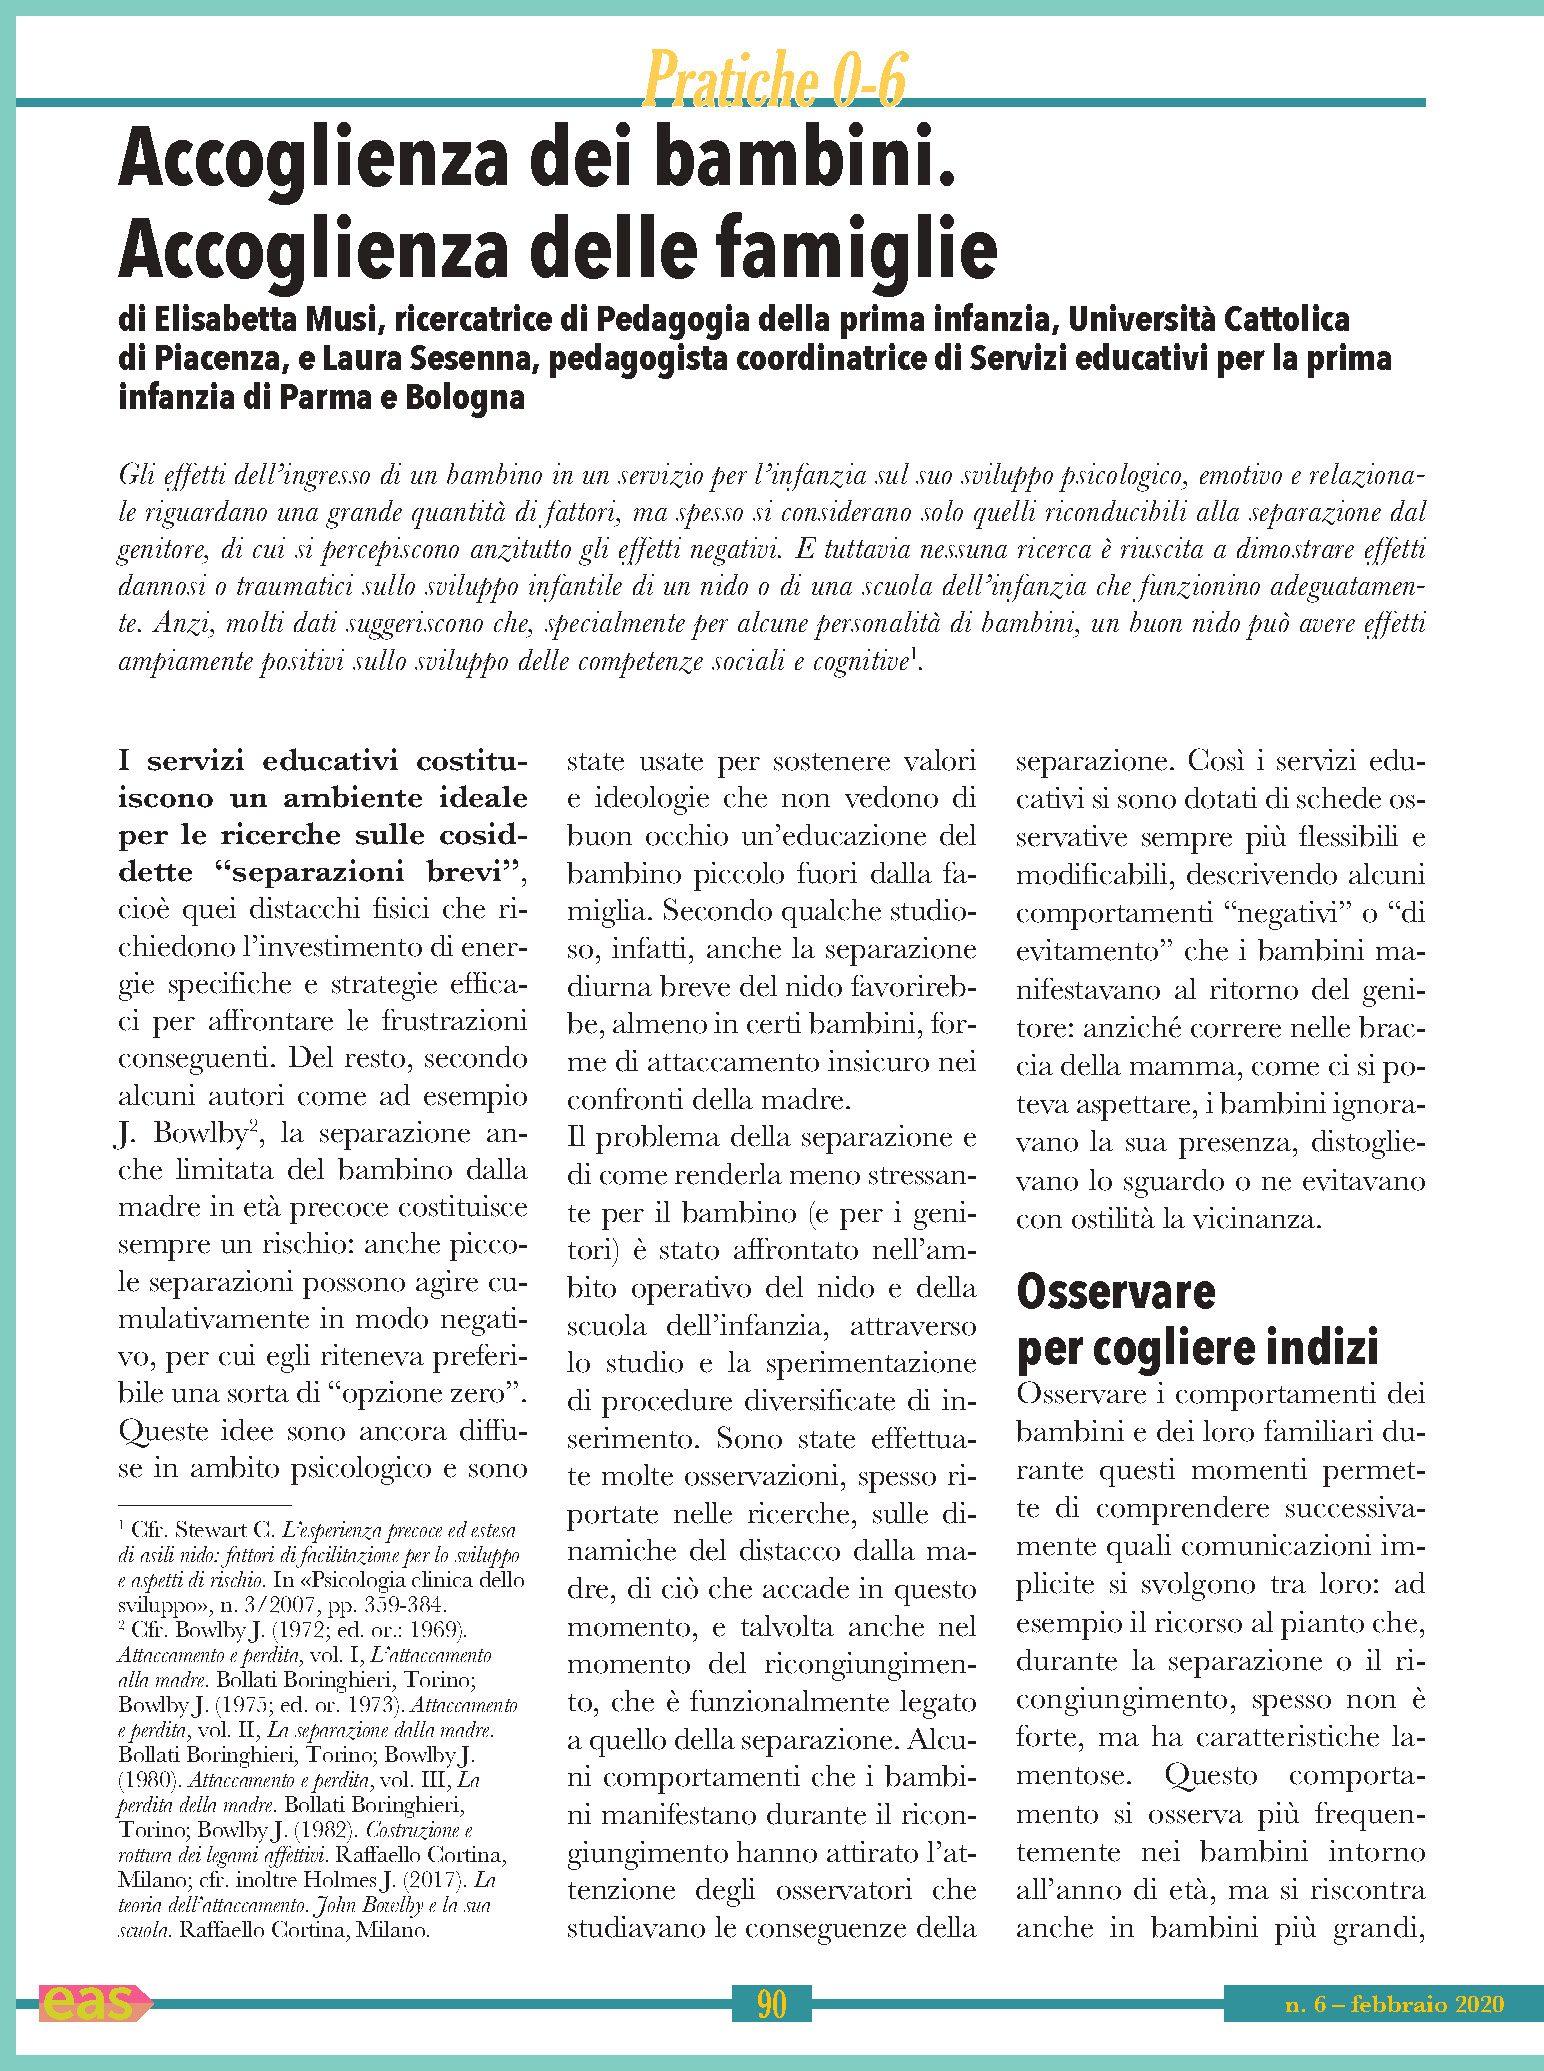 Articolo Musi Sesenna_Pagina_1.jpg